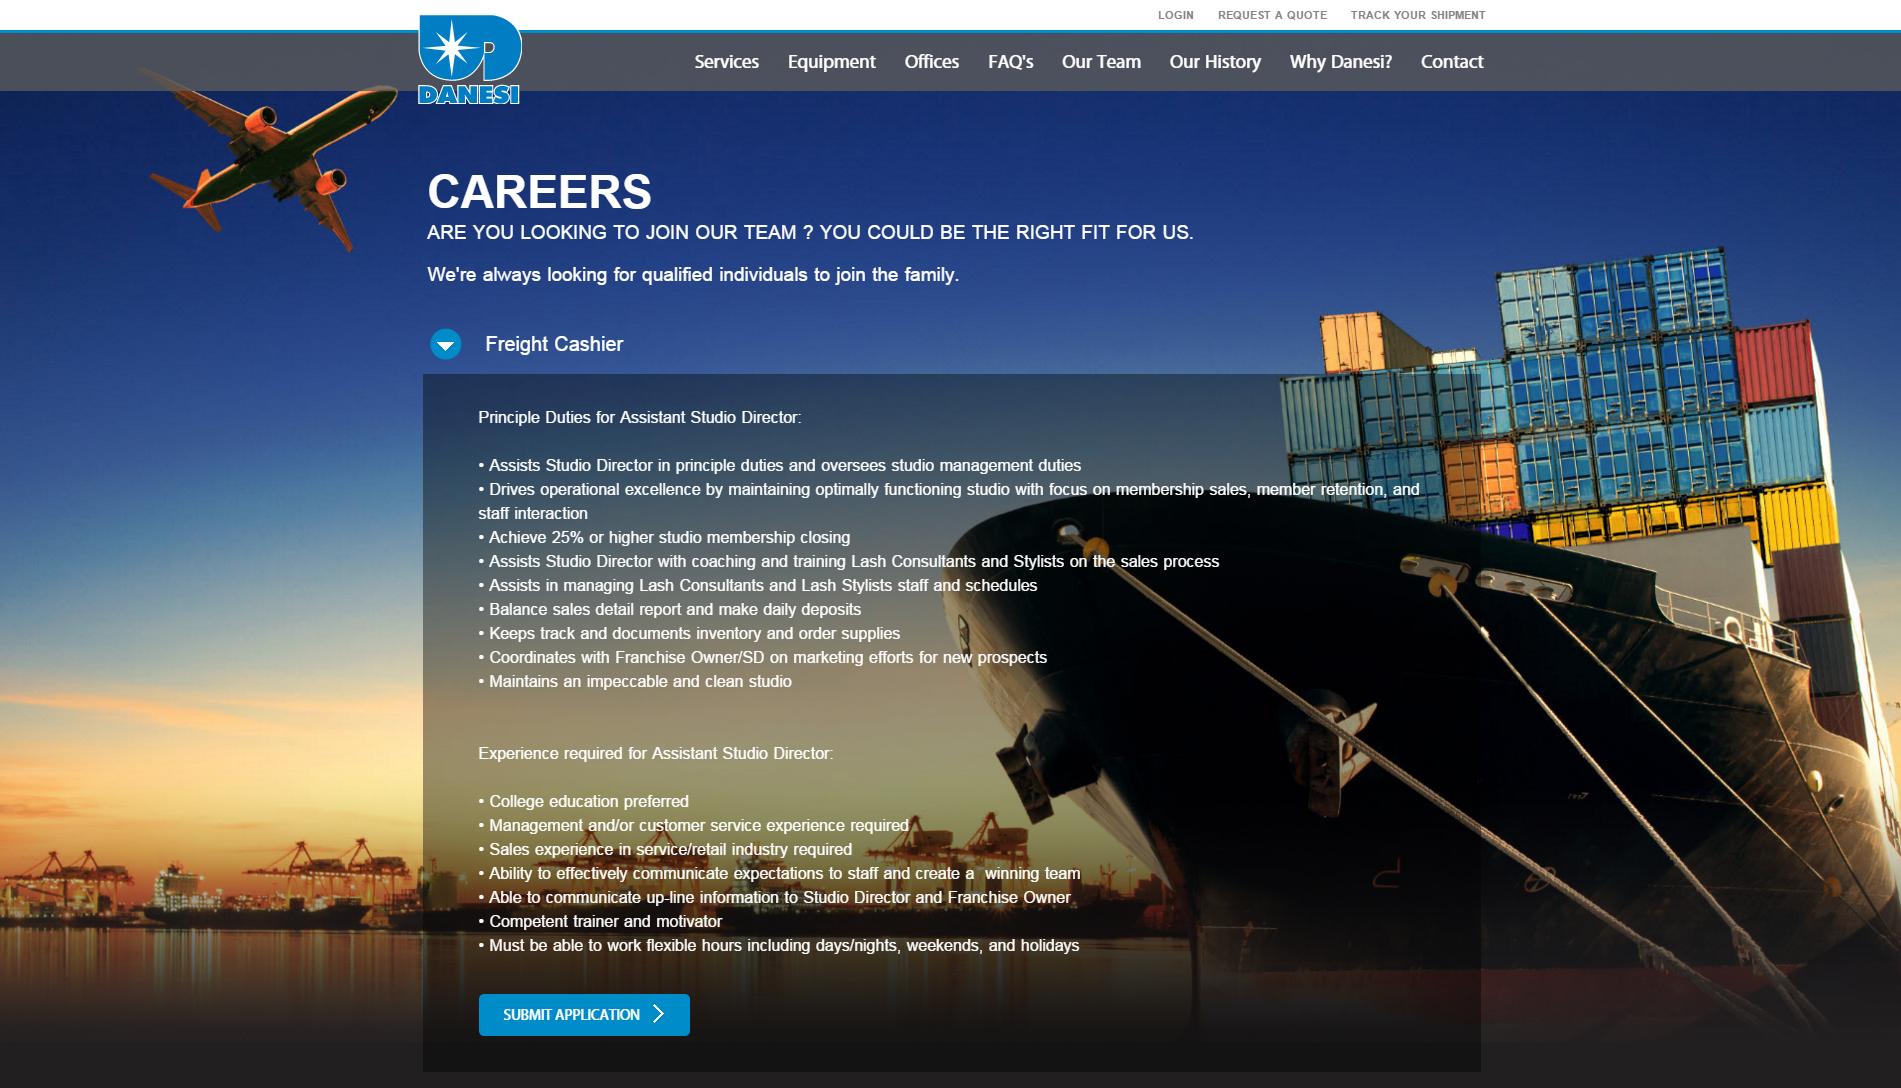 Danesi-Careers